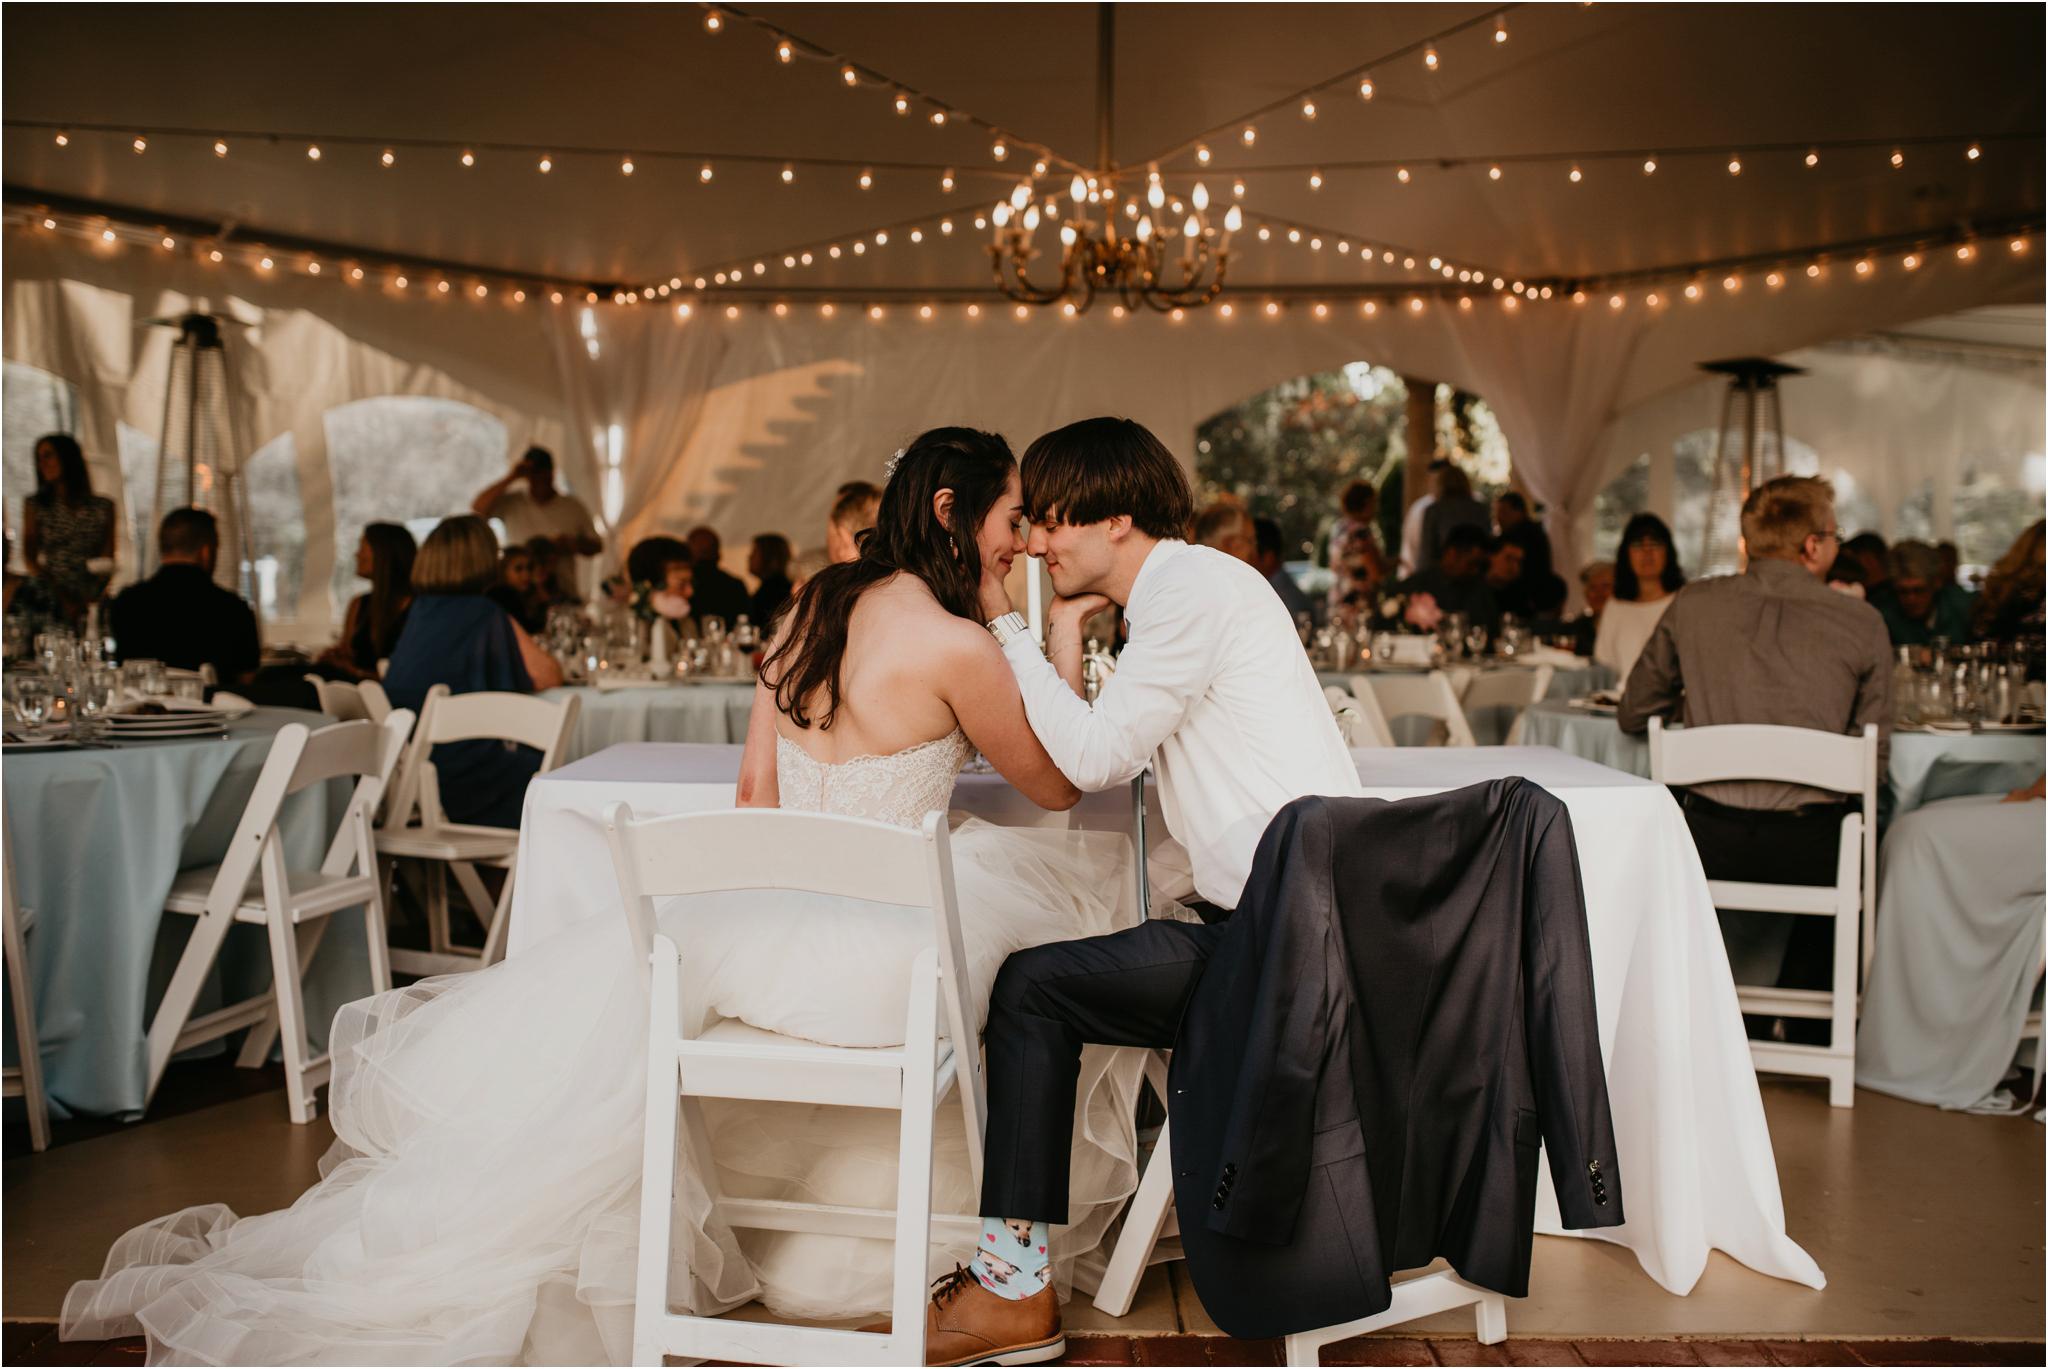 chance-and-ondrea-lairmont-manor-wedding-seattle-photographer-100.jpg